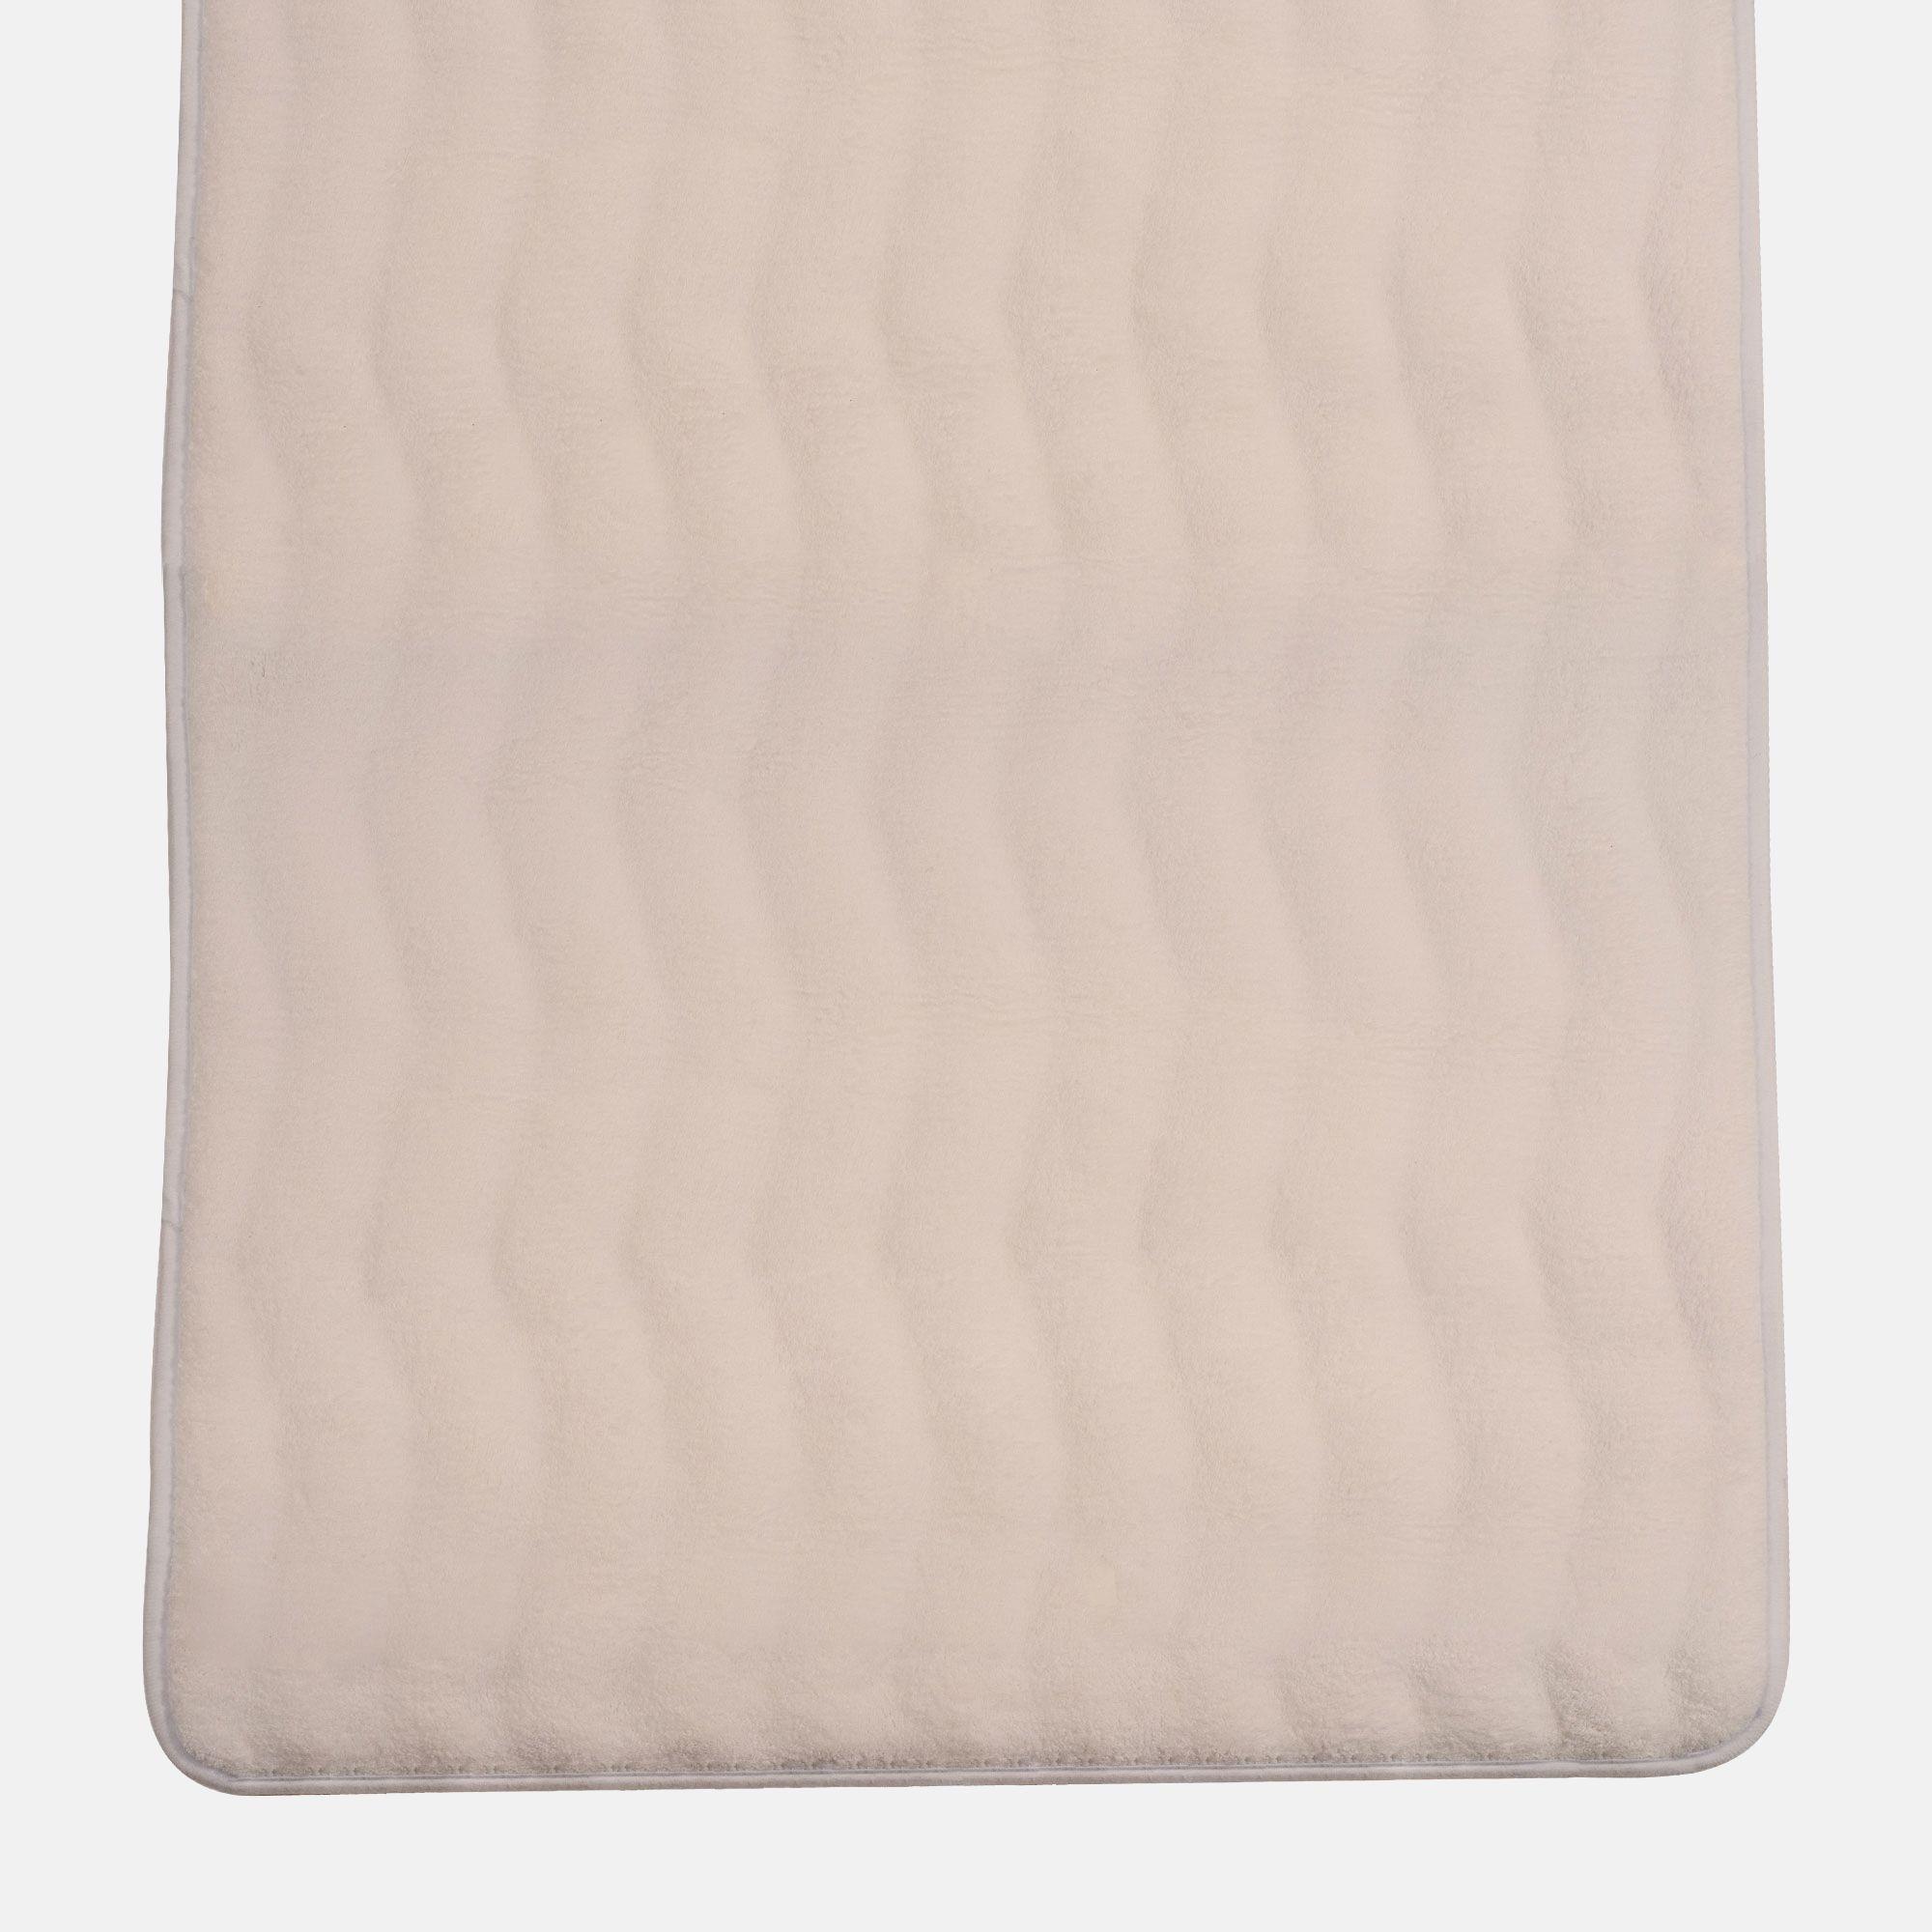 Lavish Home Memory Foam Extra Long Bath Mats Tanga